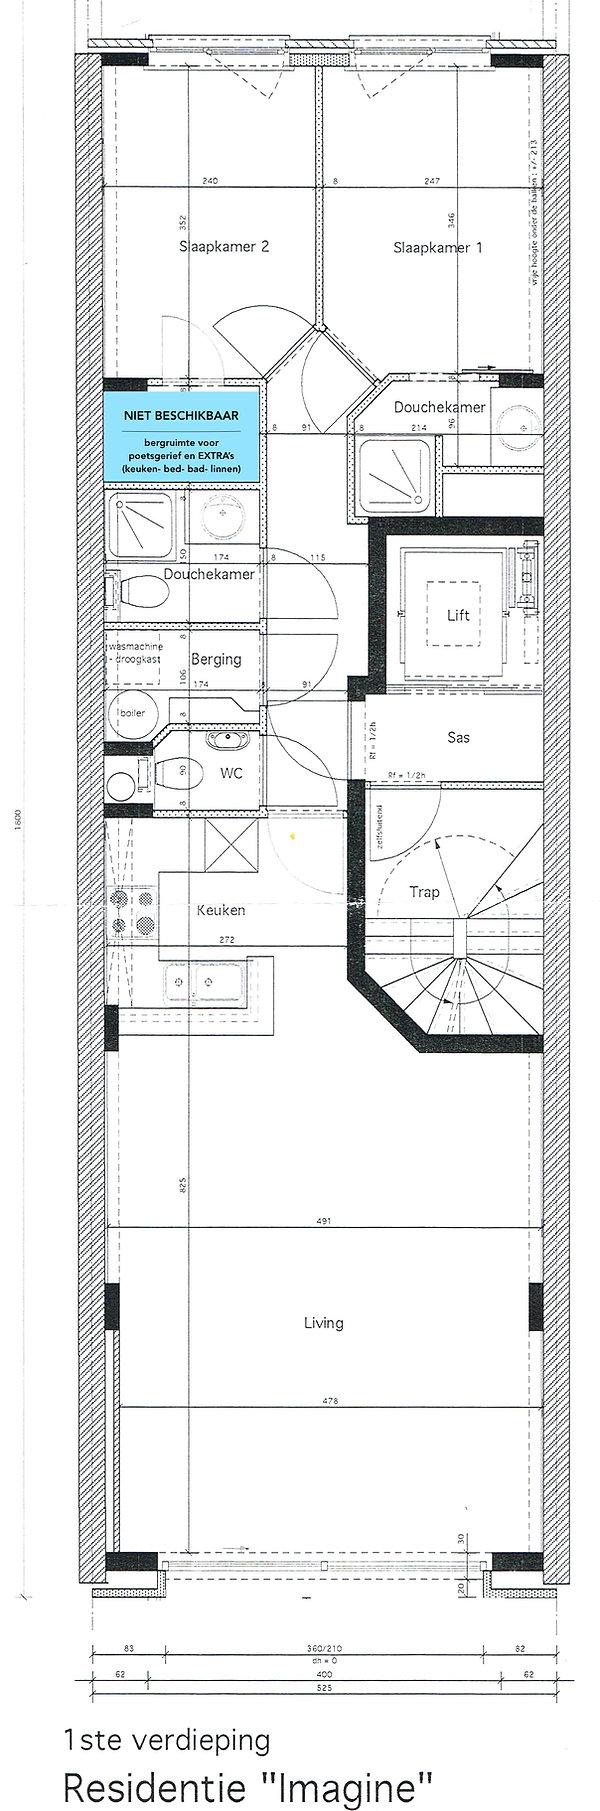 imagine_grondplan-S_versie_privé.jpg